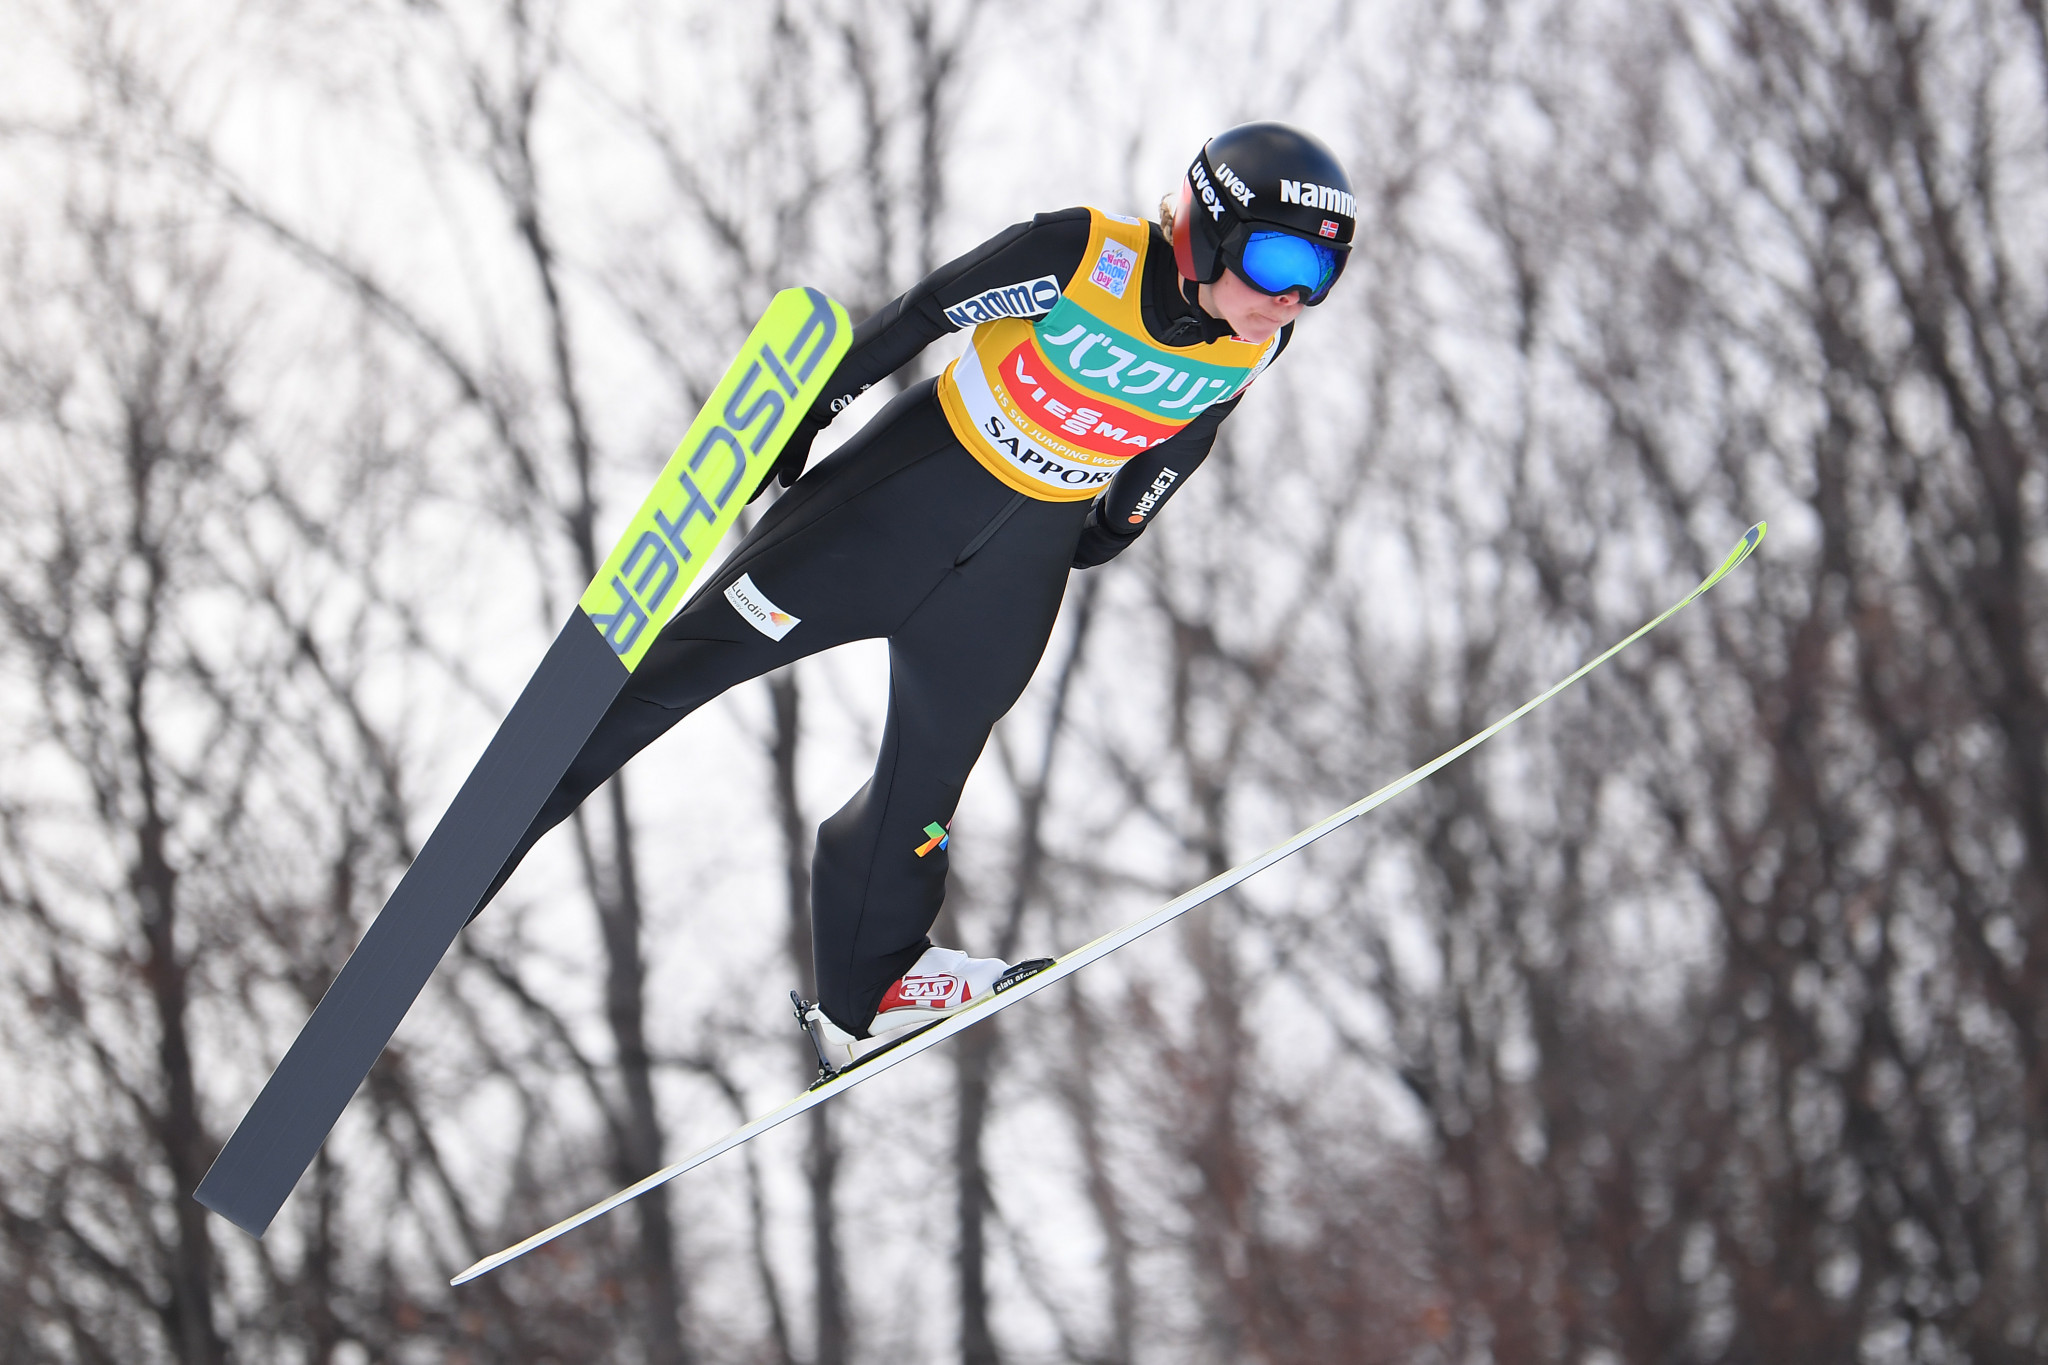 Lundby regains advantage in FIS Ski Jumping World Cup